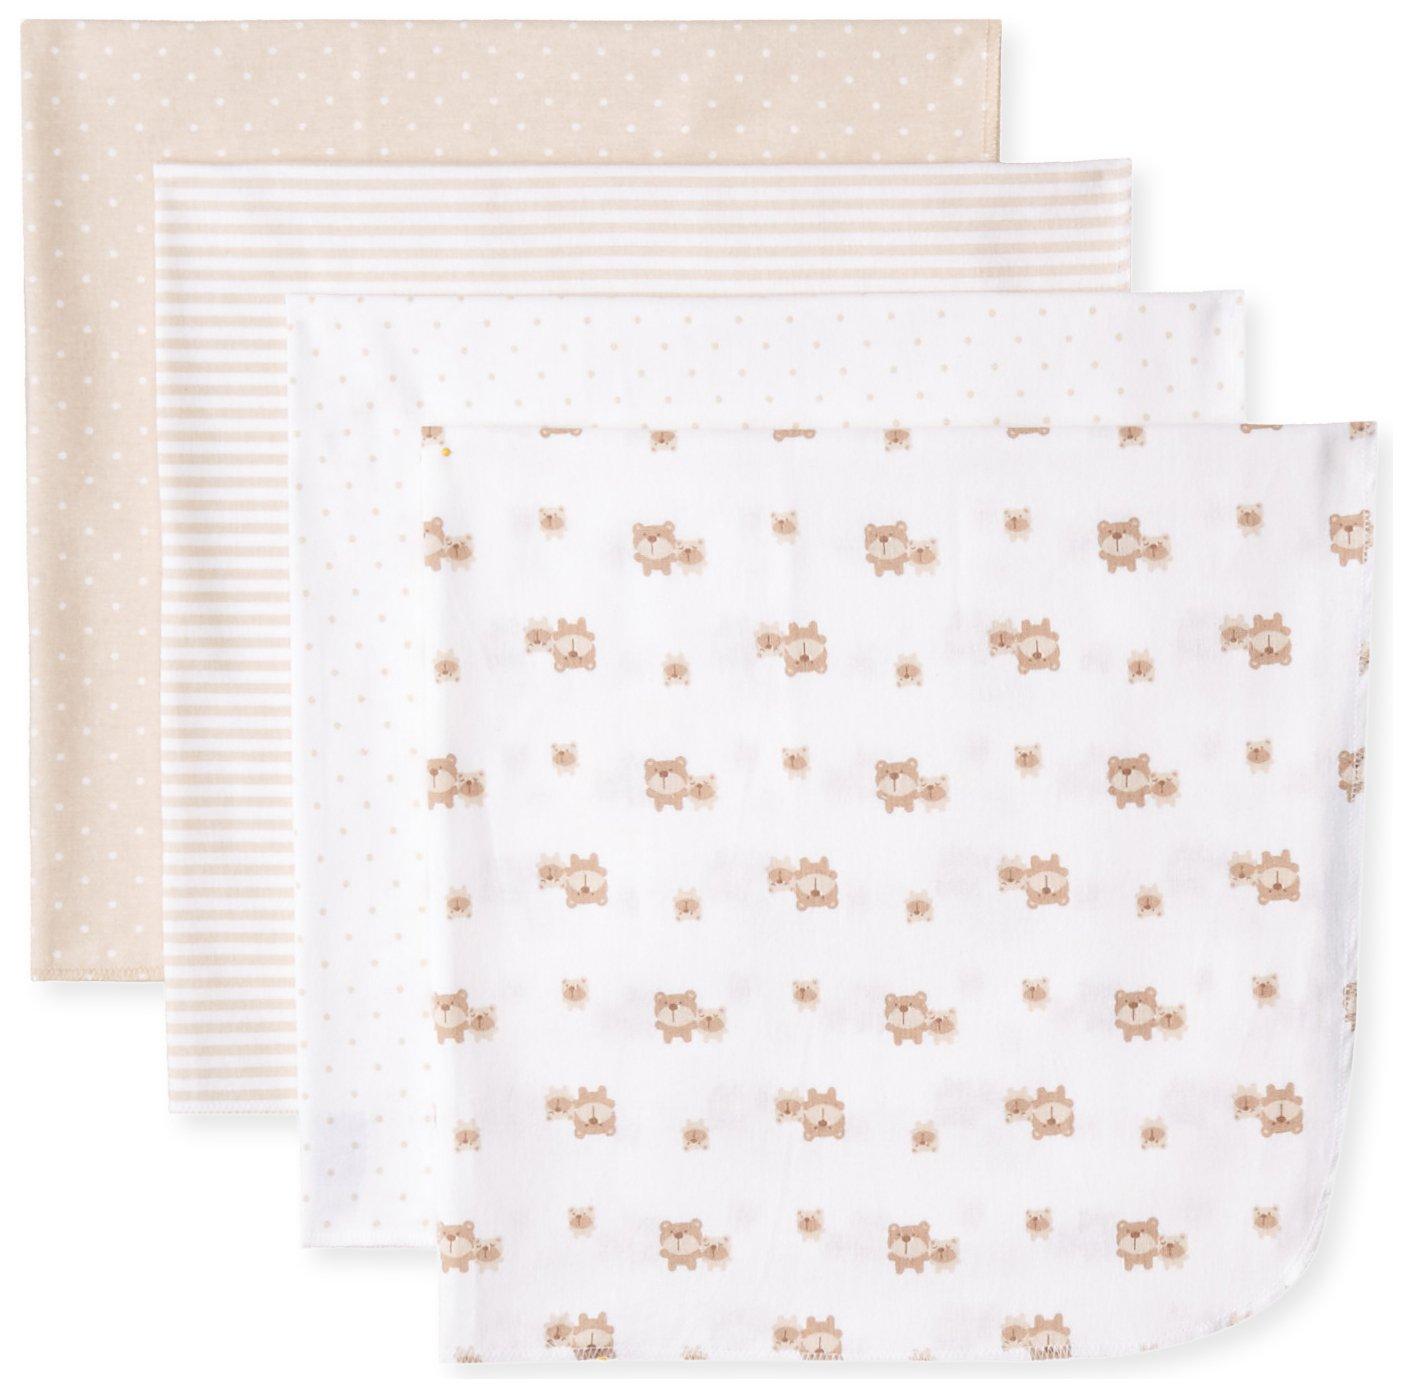 Gerber Unisex-Baby Newborn 4 Pack Flannel Blanket Bears, Brown, One Size